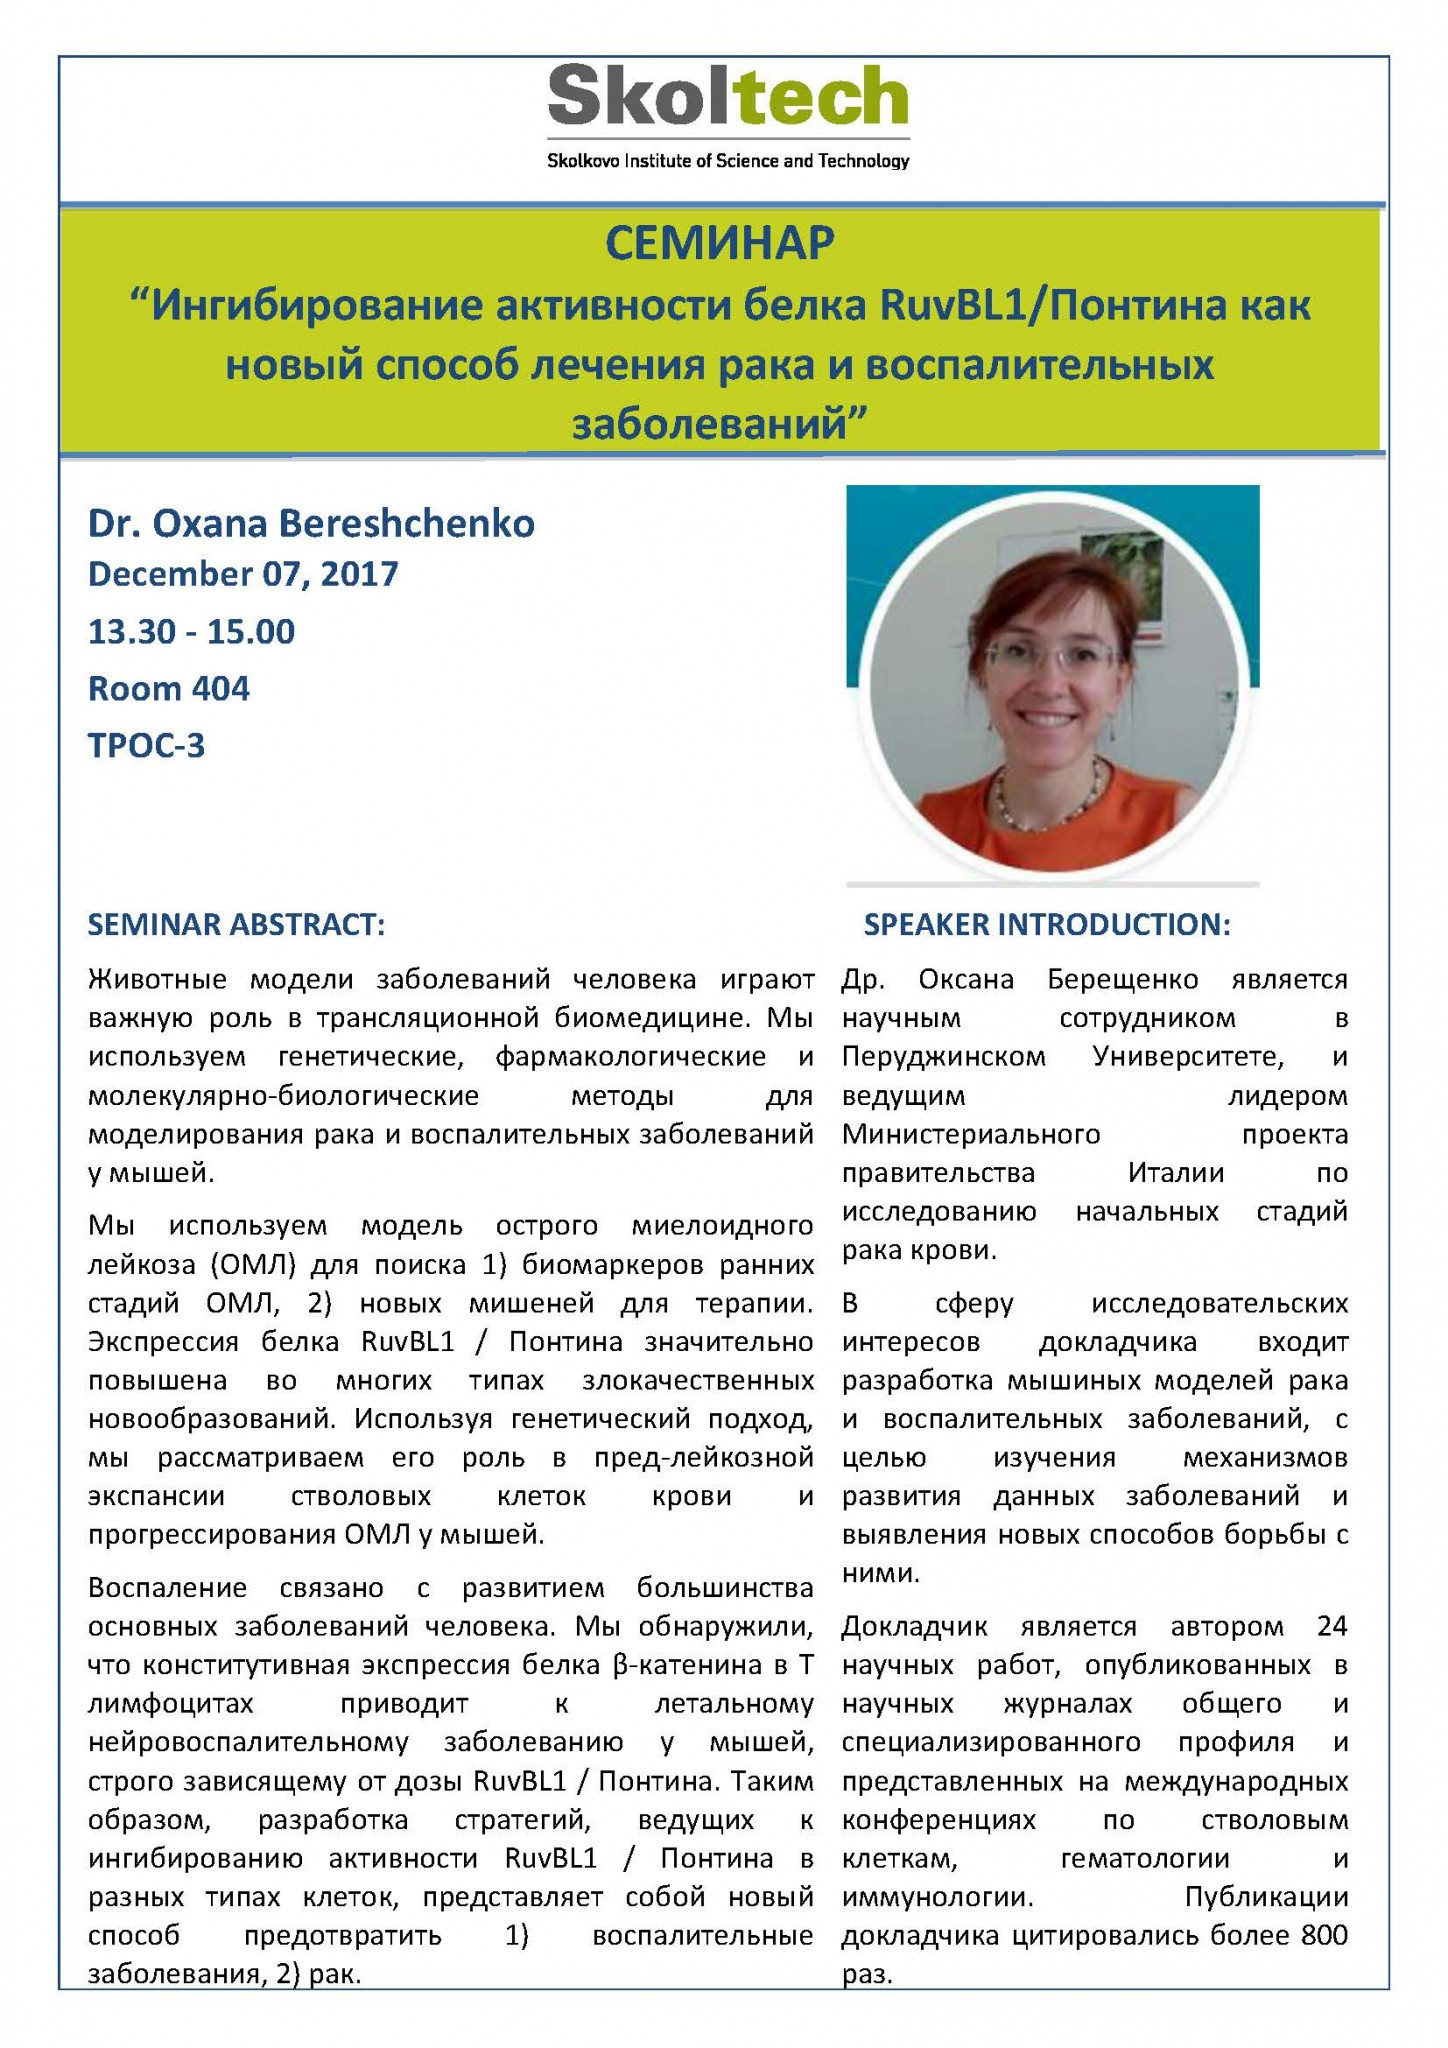 dr-oxana-bereshchenko-seminar-announcement-dec-7-rus